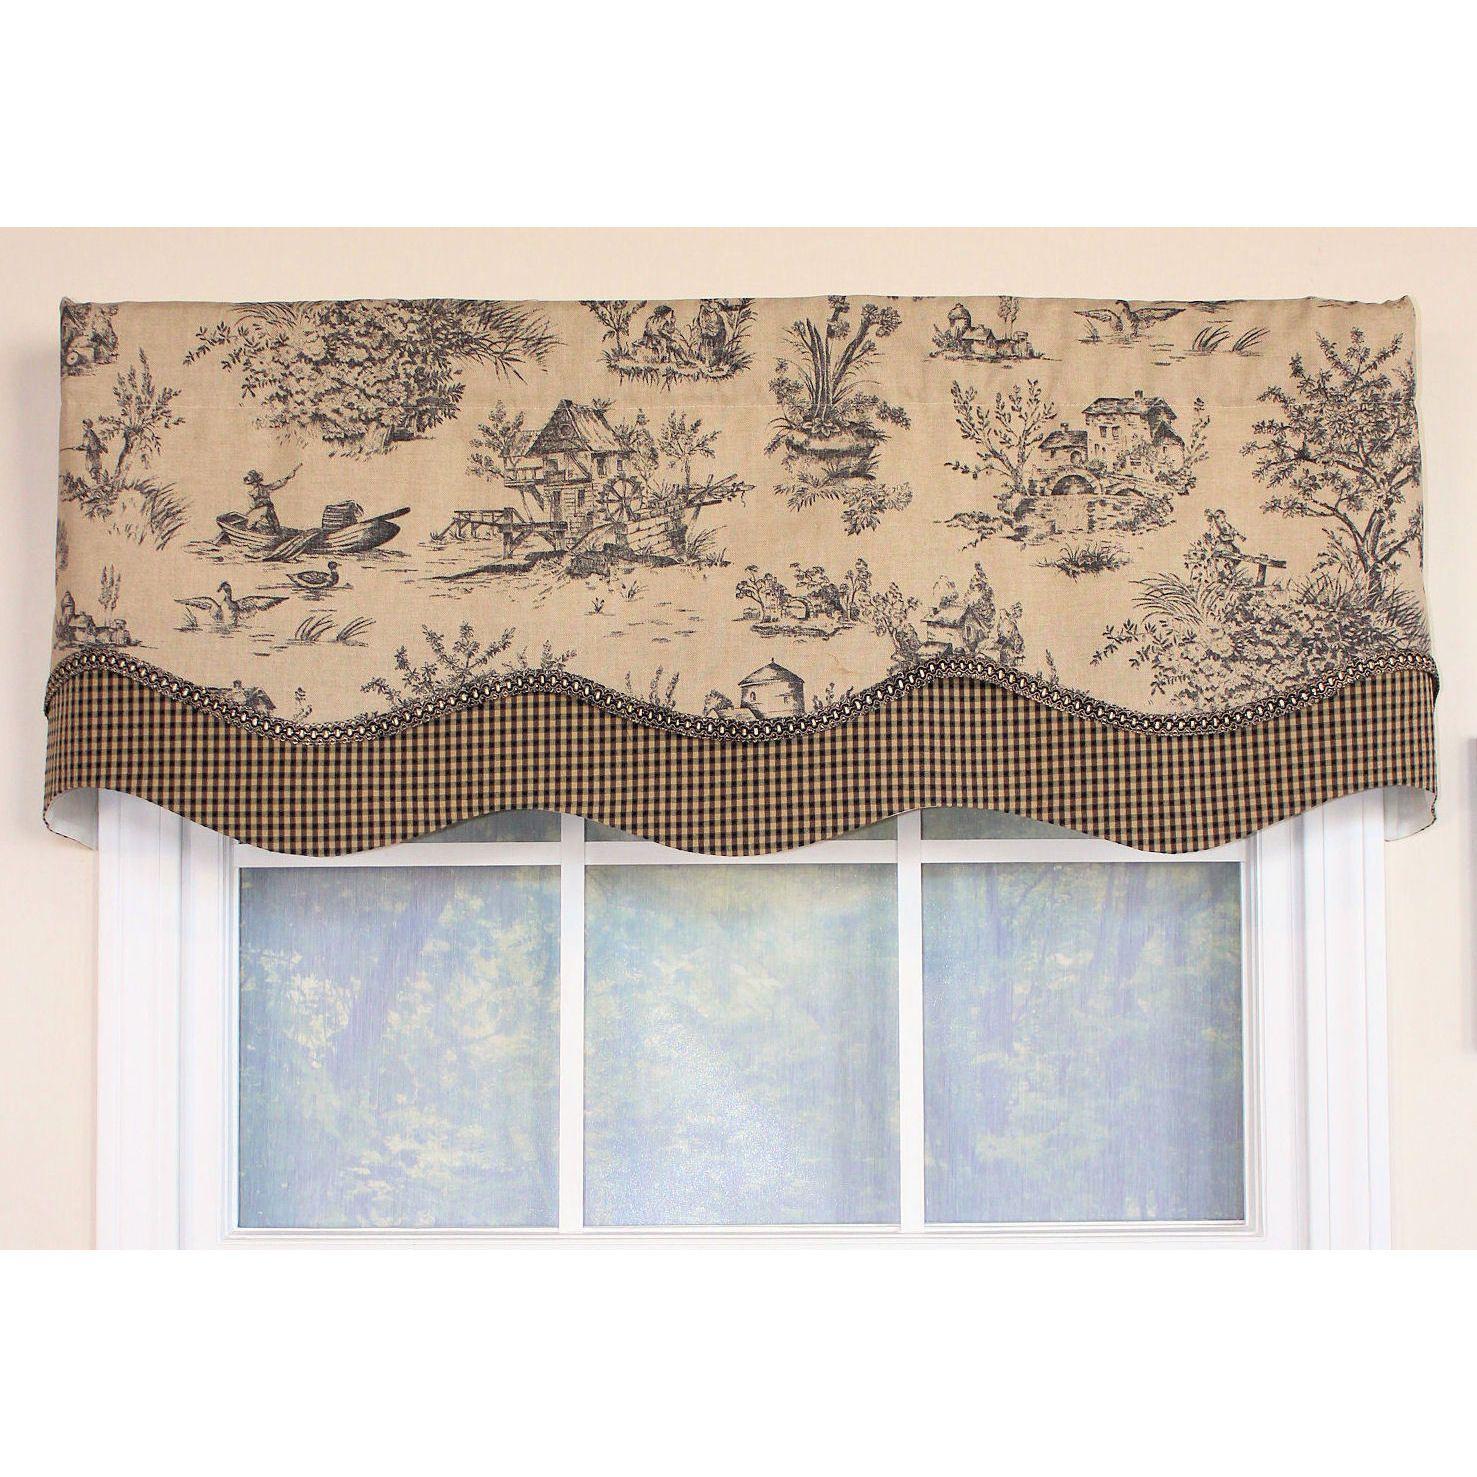 Country Side Charcoal Glory Window Valance, Grey, RLF HOME